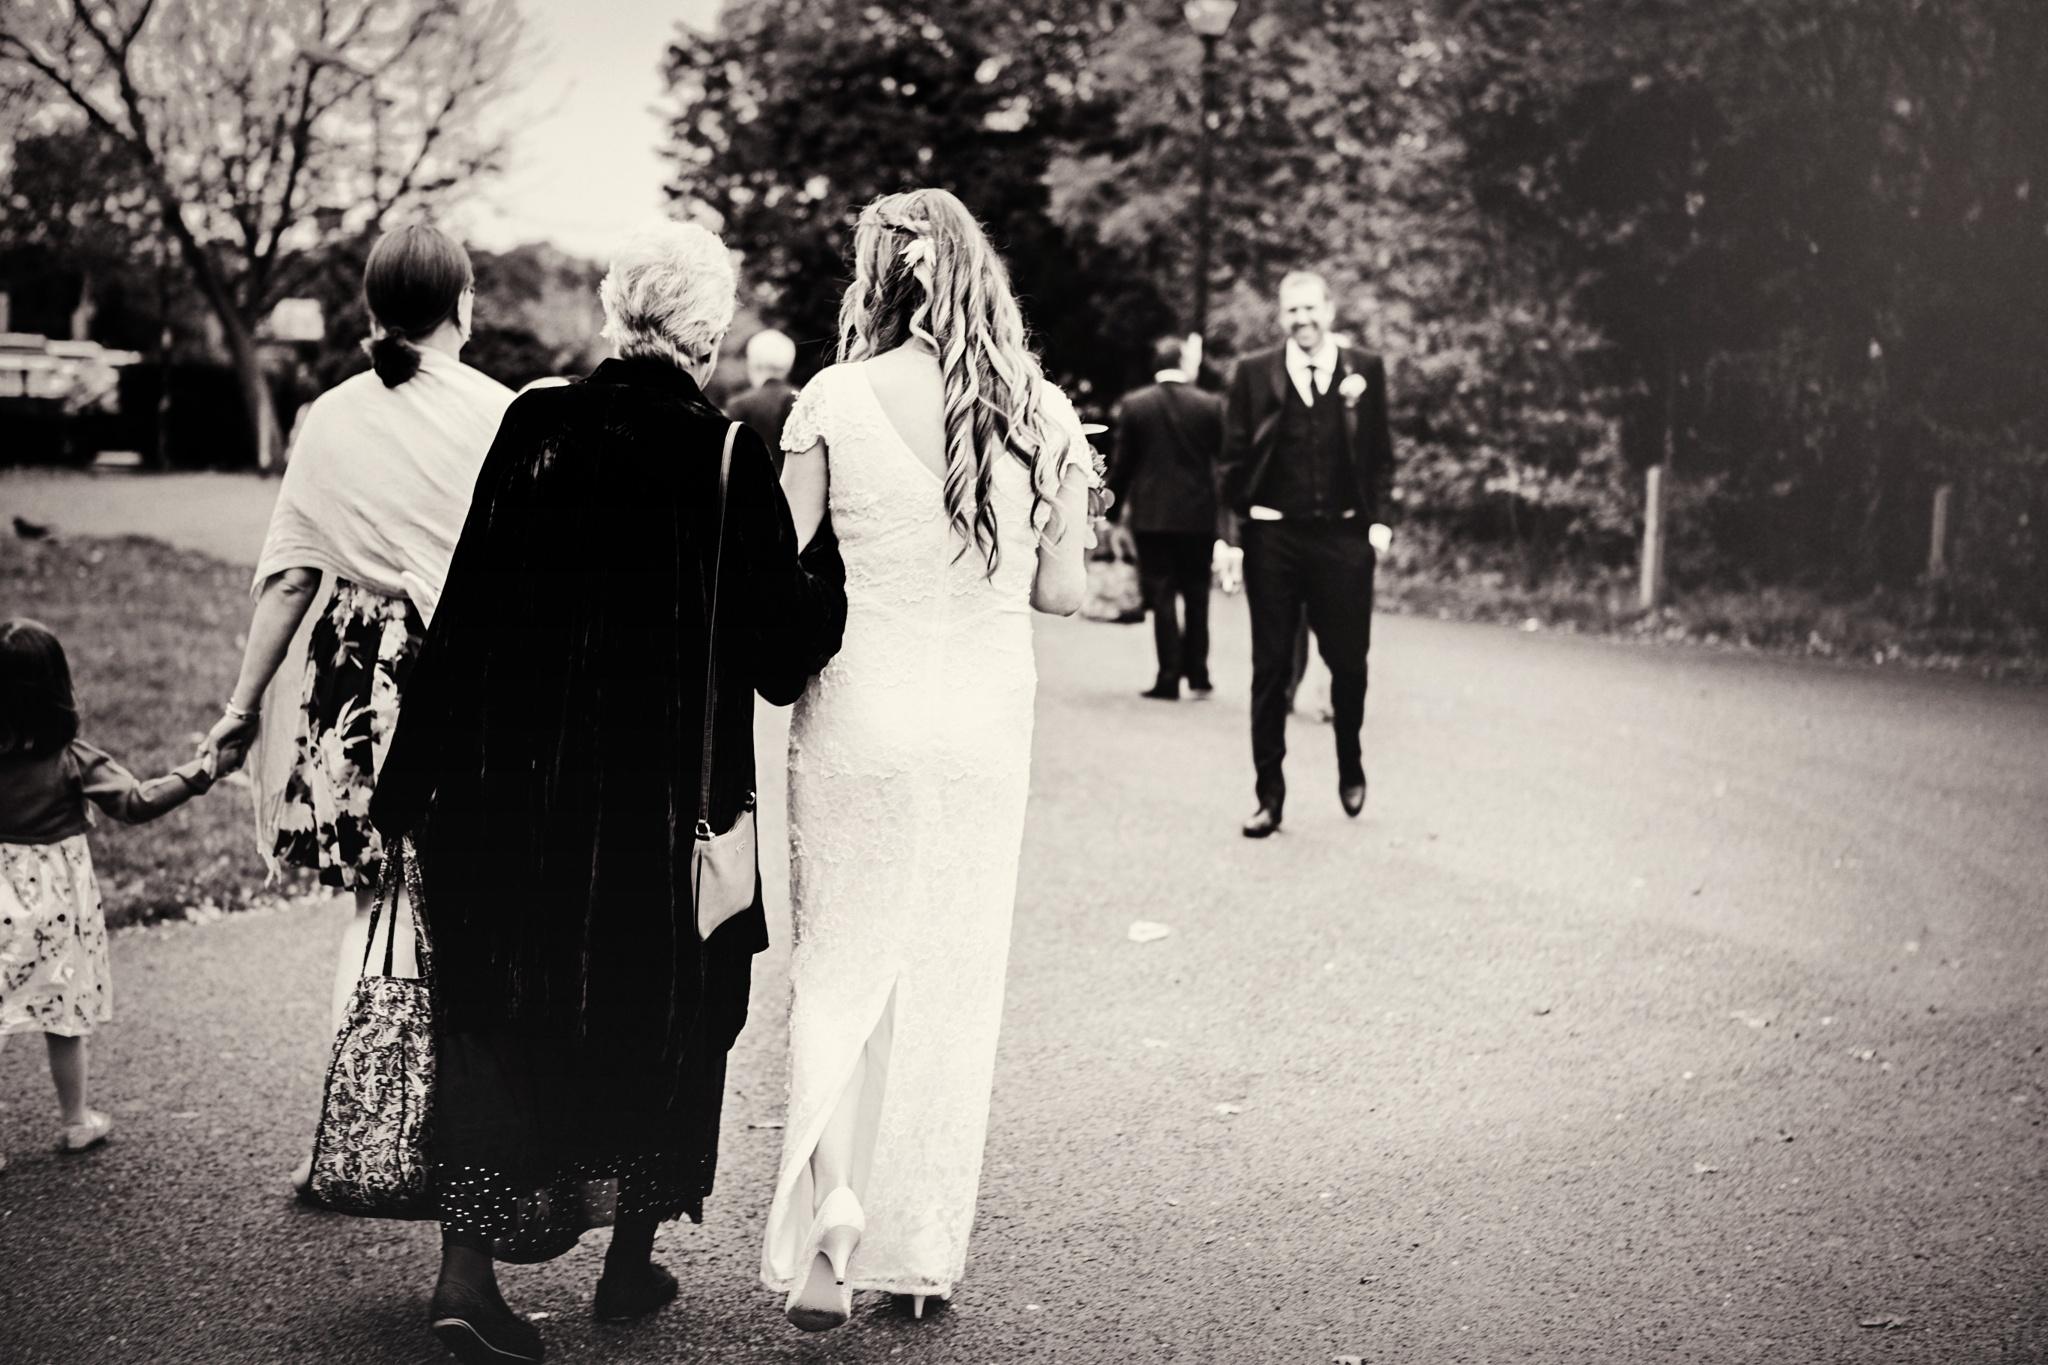 wedding walk by kinga.kobylanska